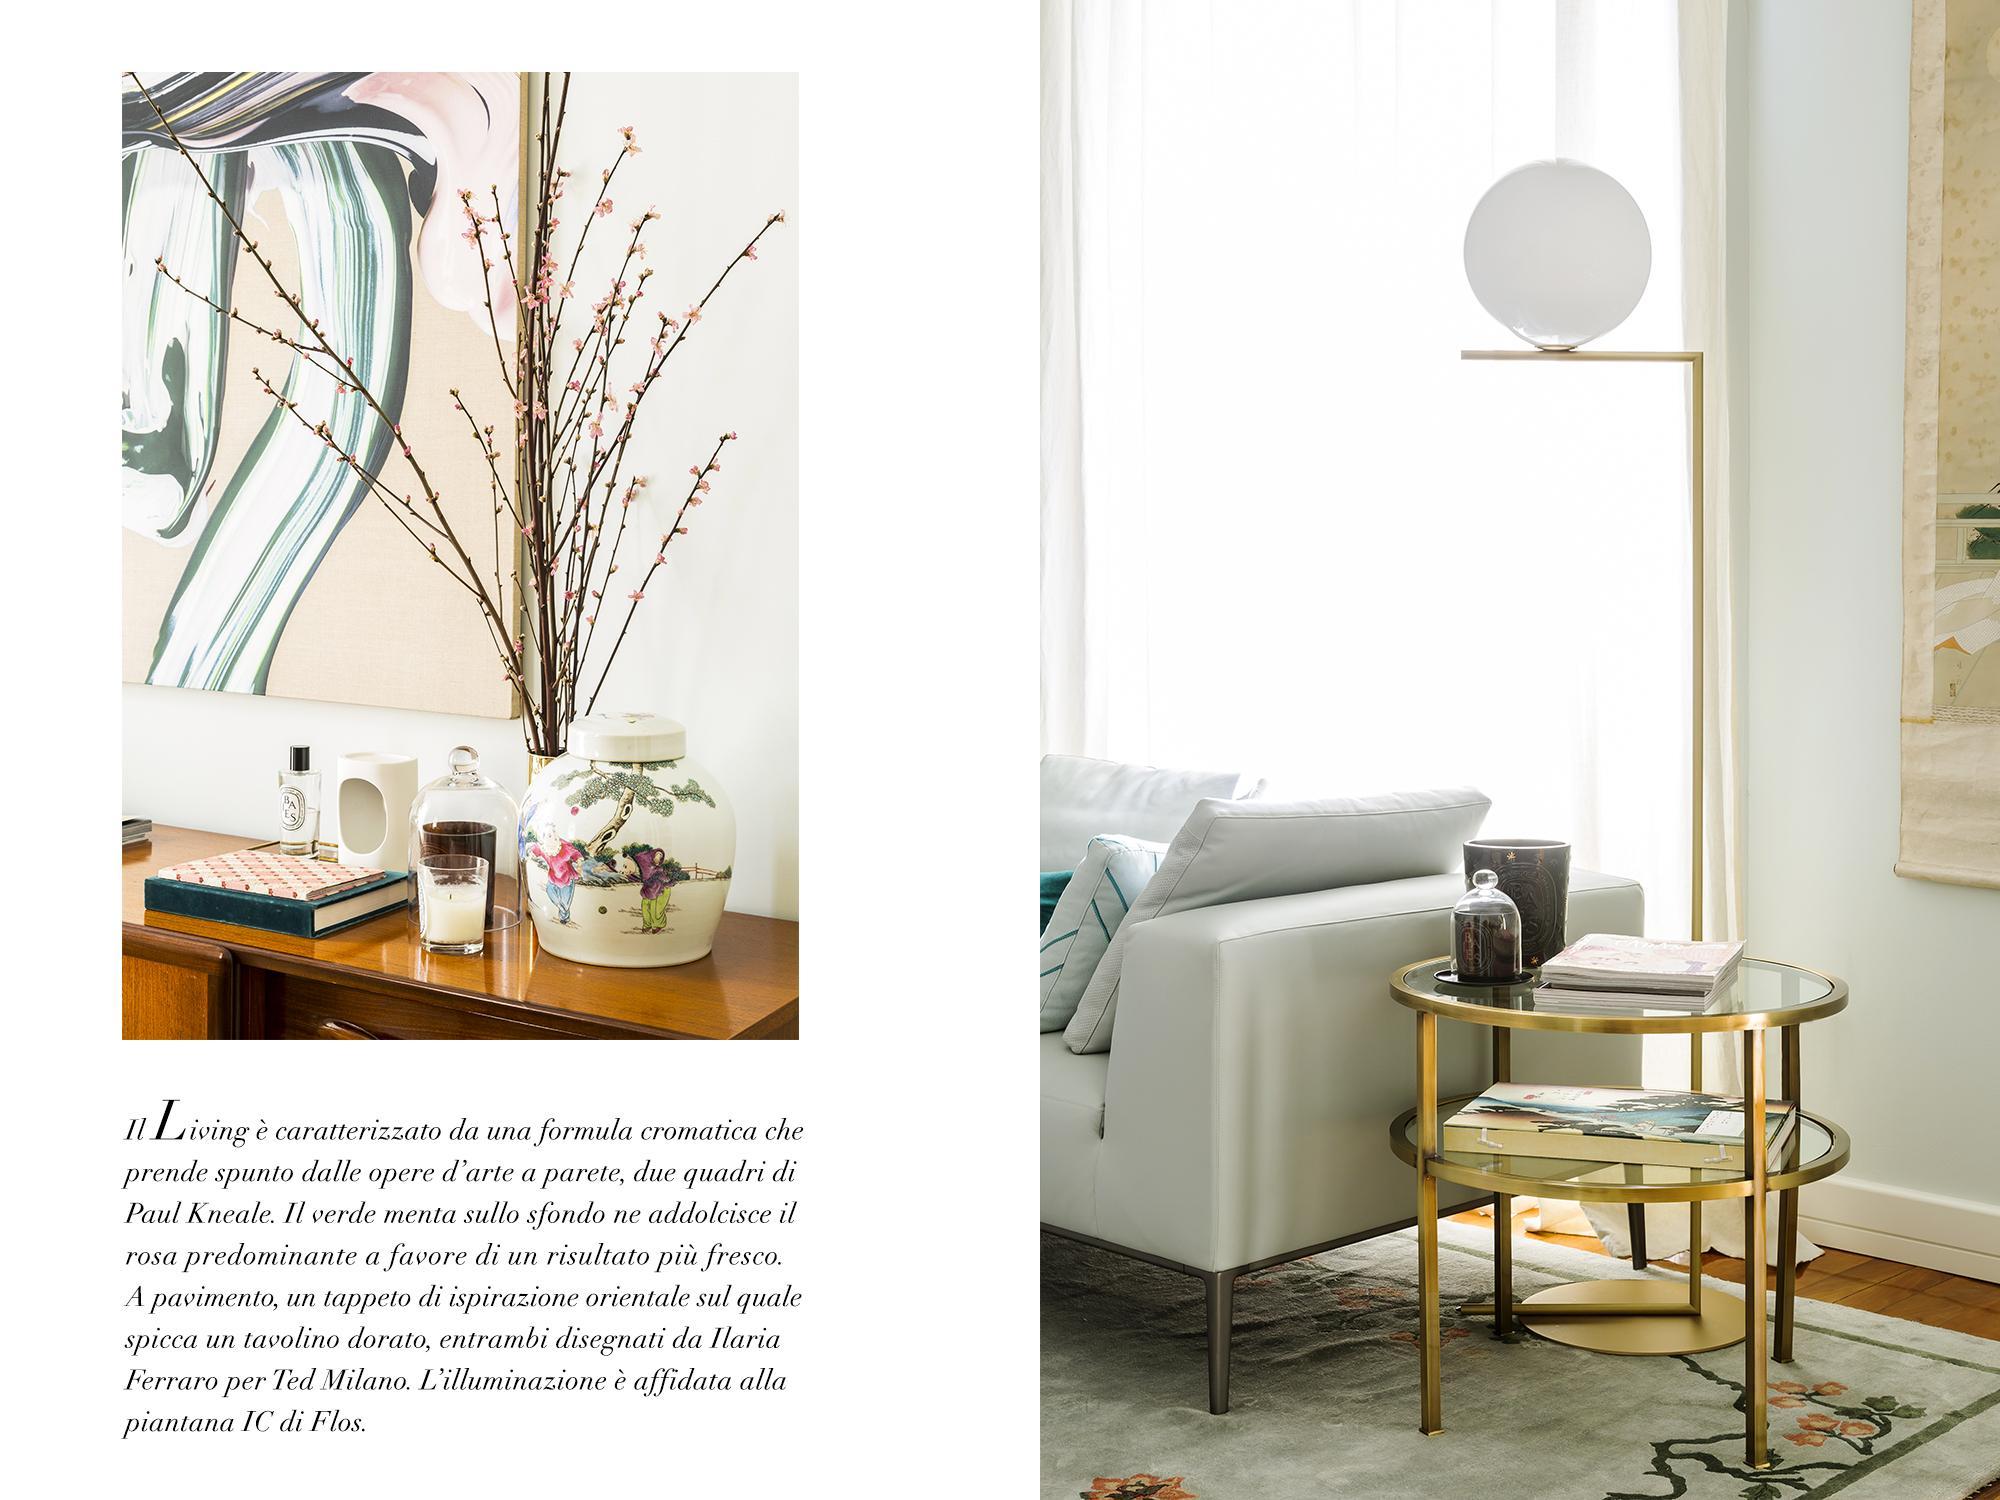 Ilaria Ferraro, Ted Milano, Casa Art déco, Casa, Stile, Milano, Design